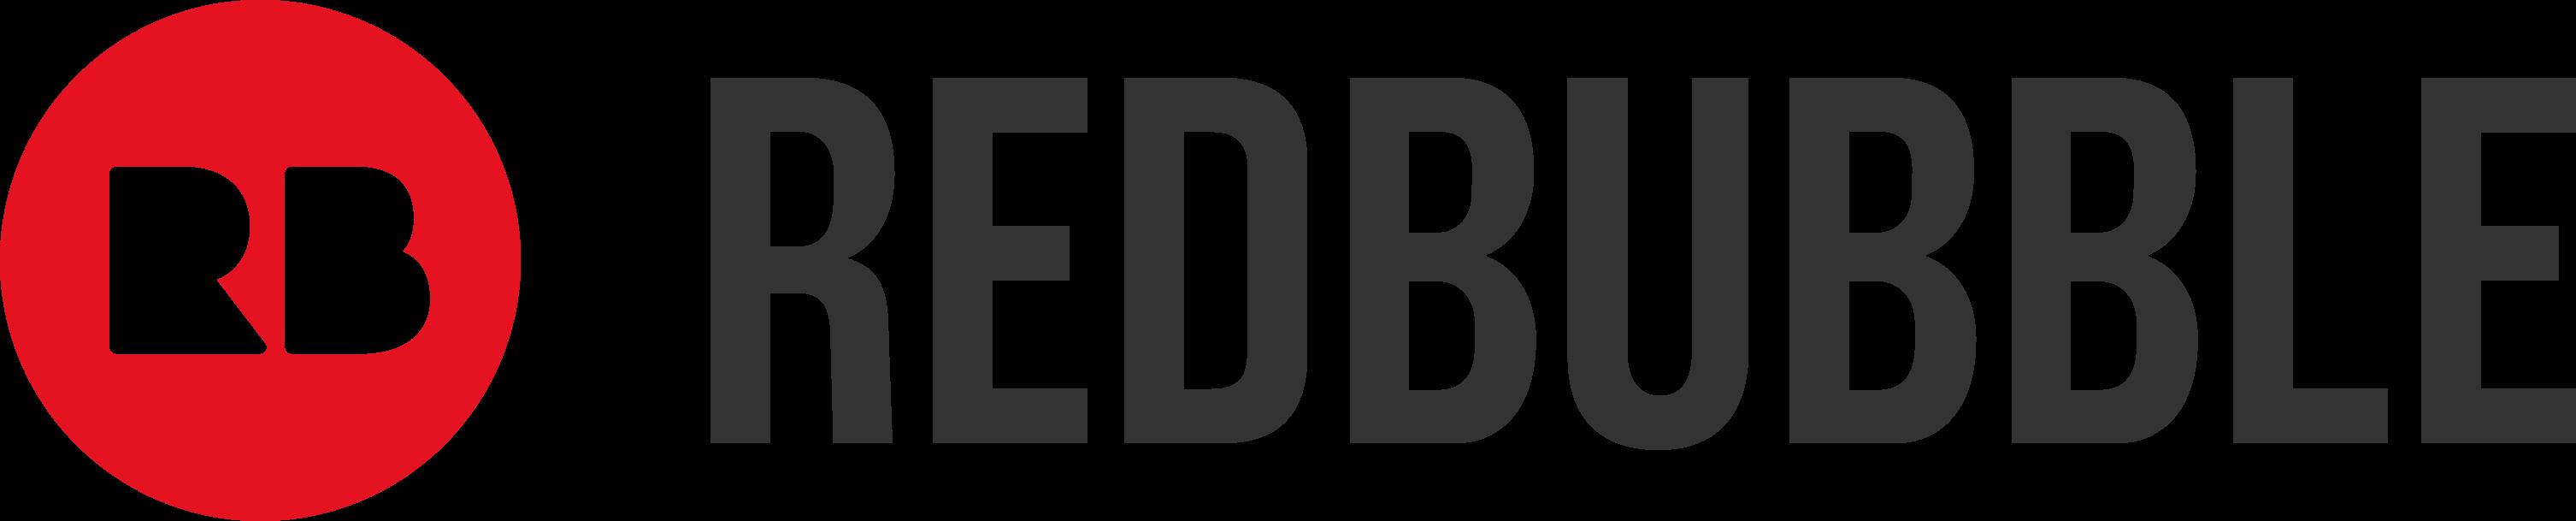 Redbubble Logo png